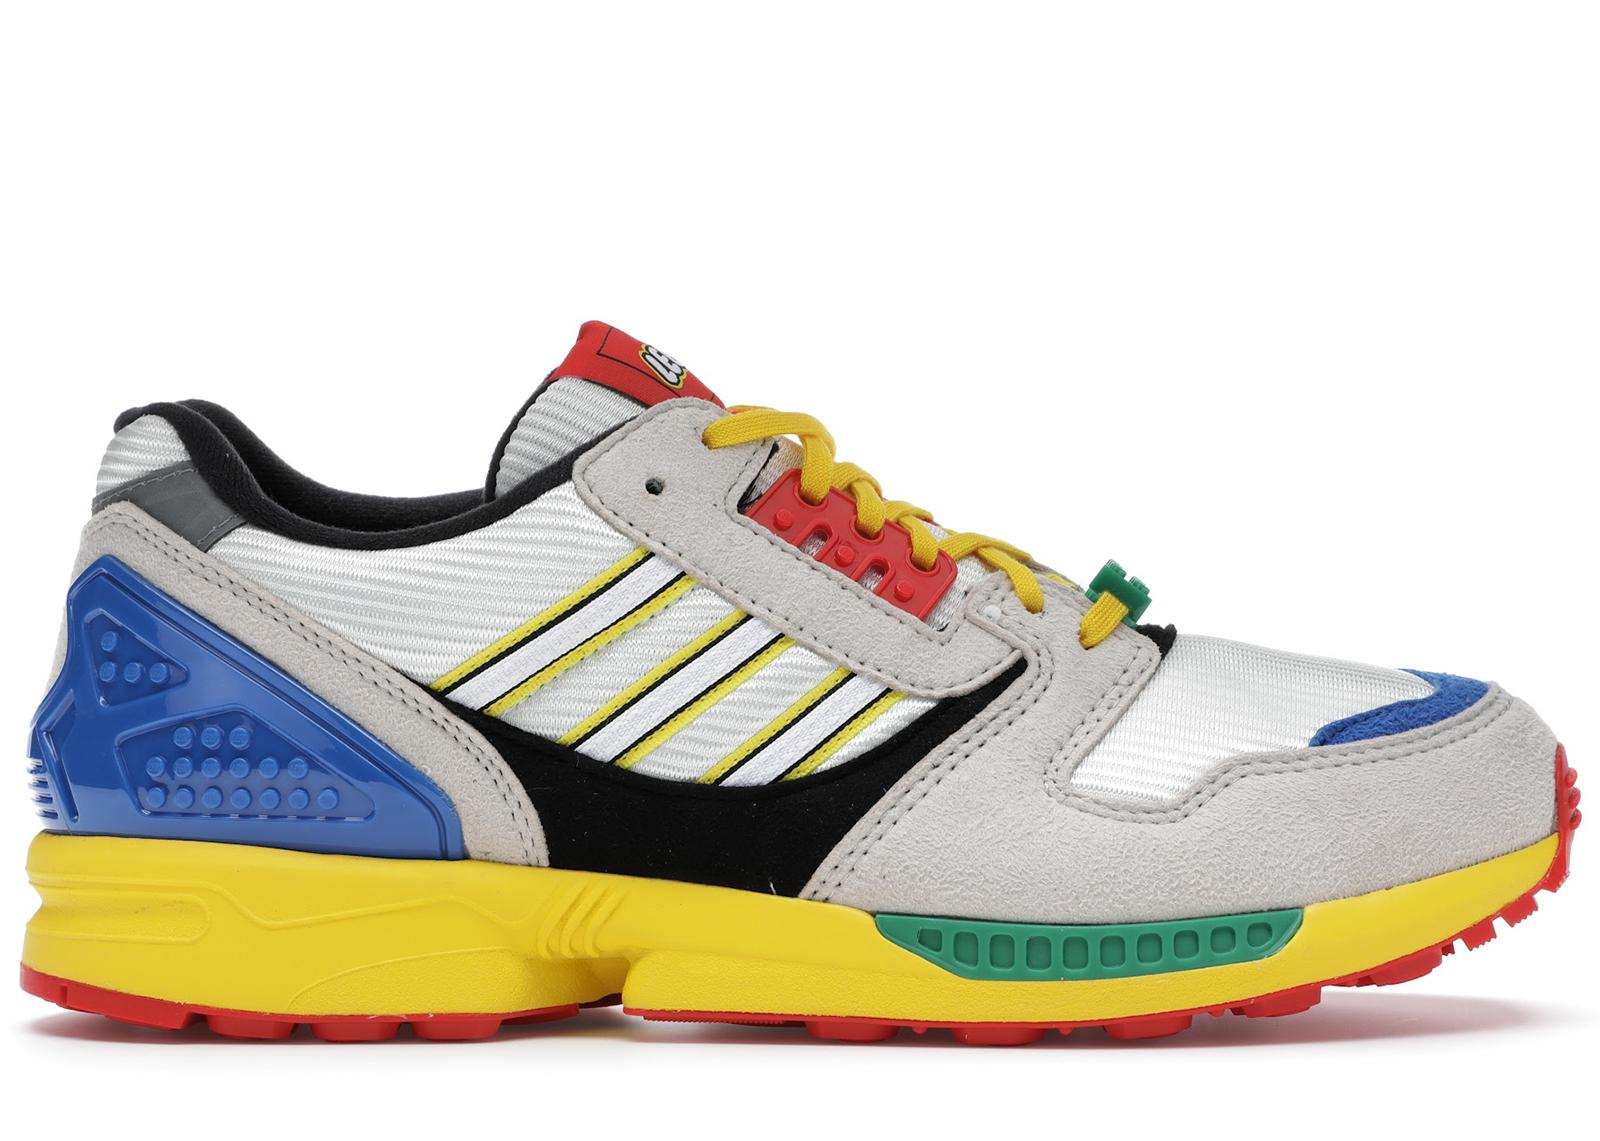 adidas stockx